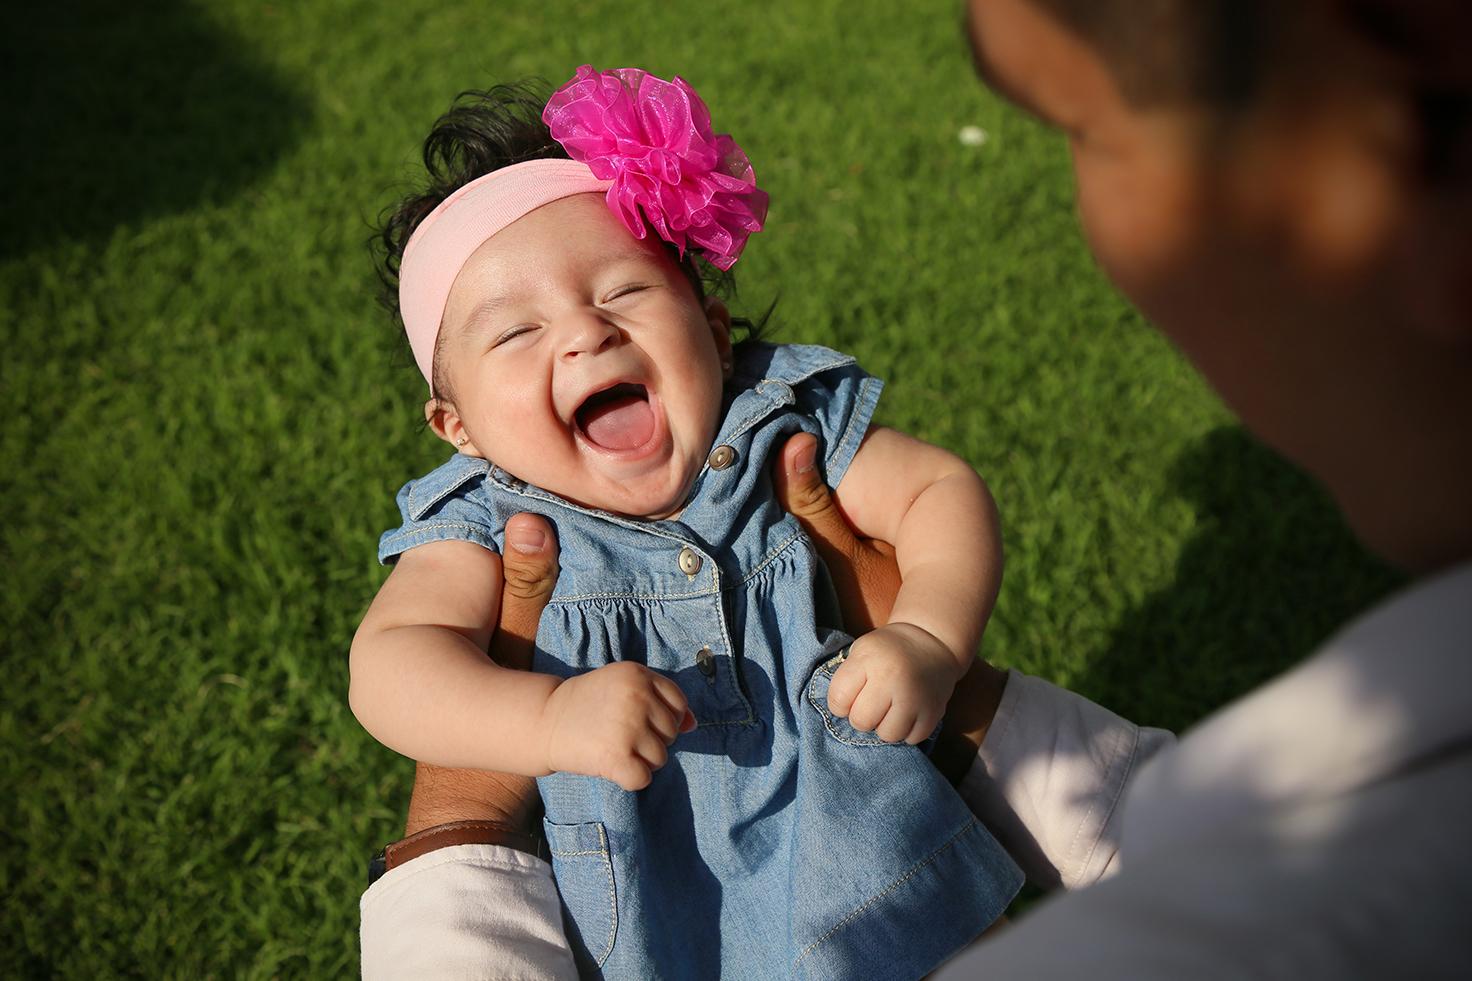 Maroge-Angela-Velazquez-fotografia-bebe-52